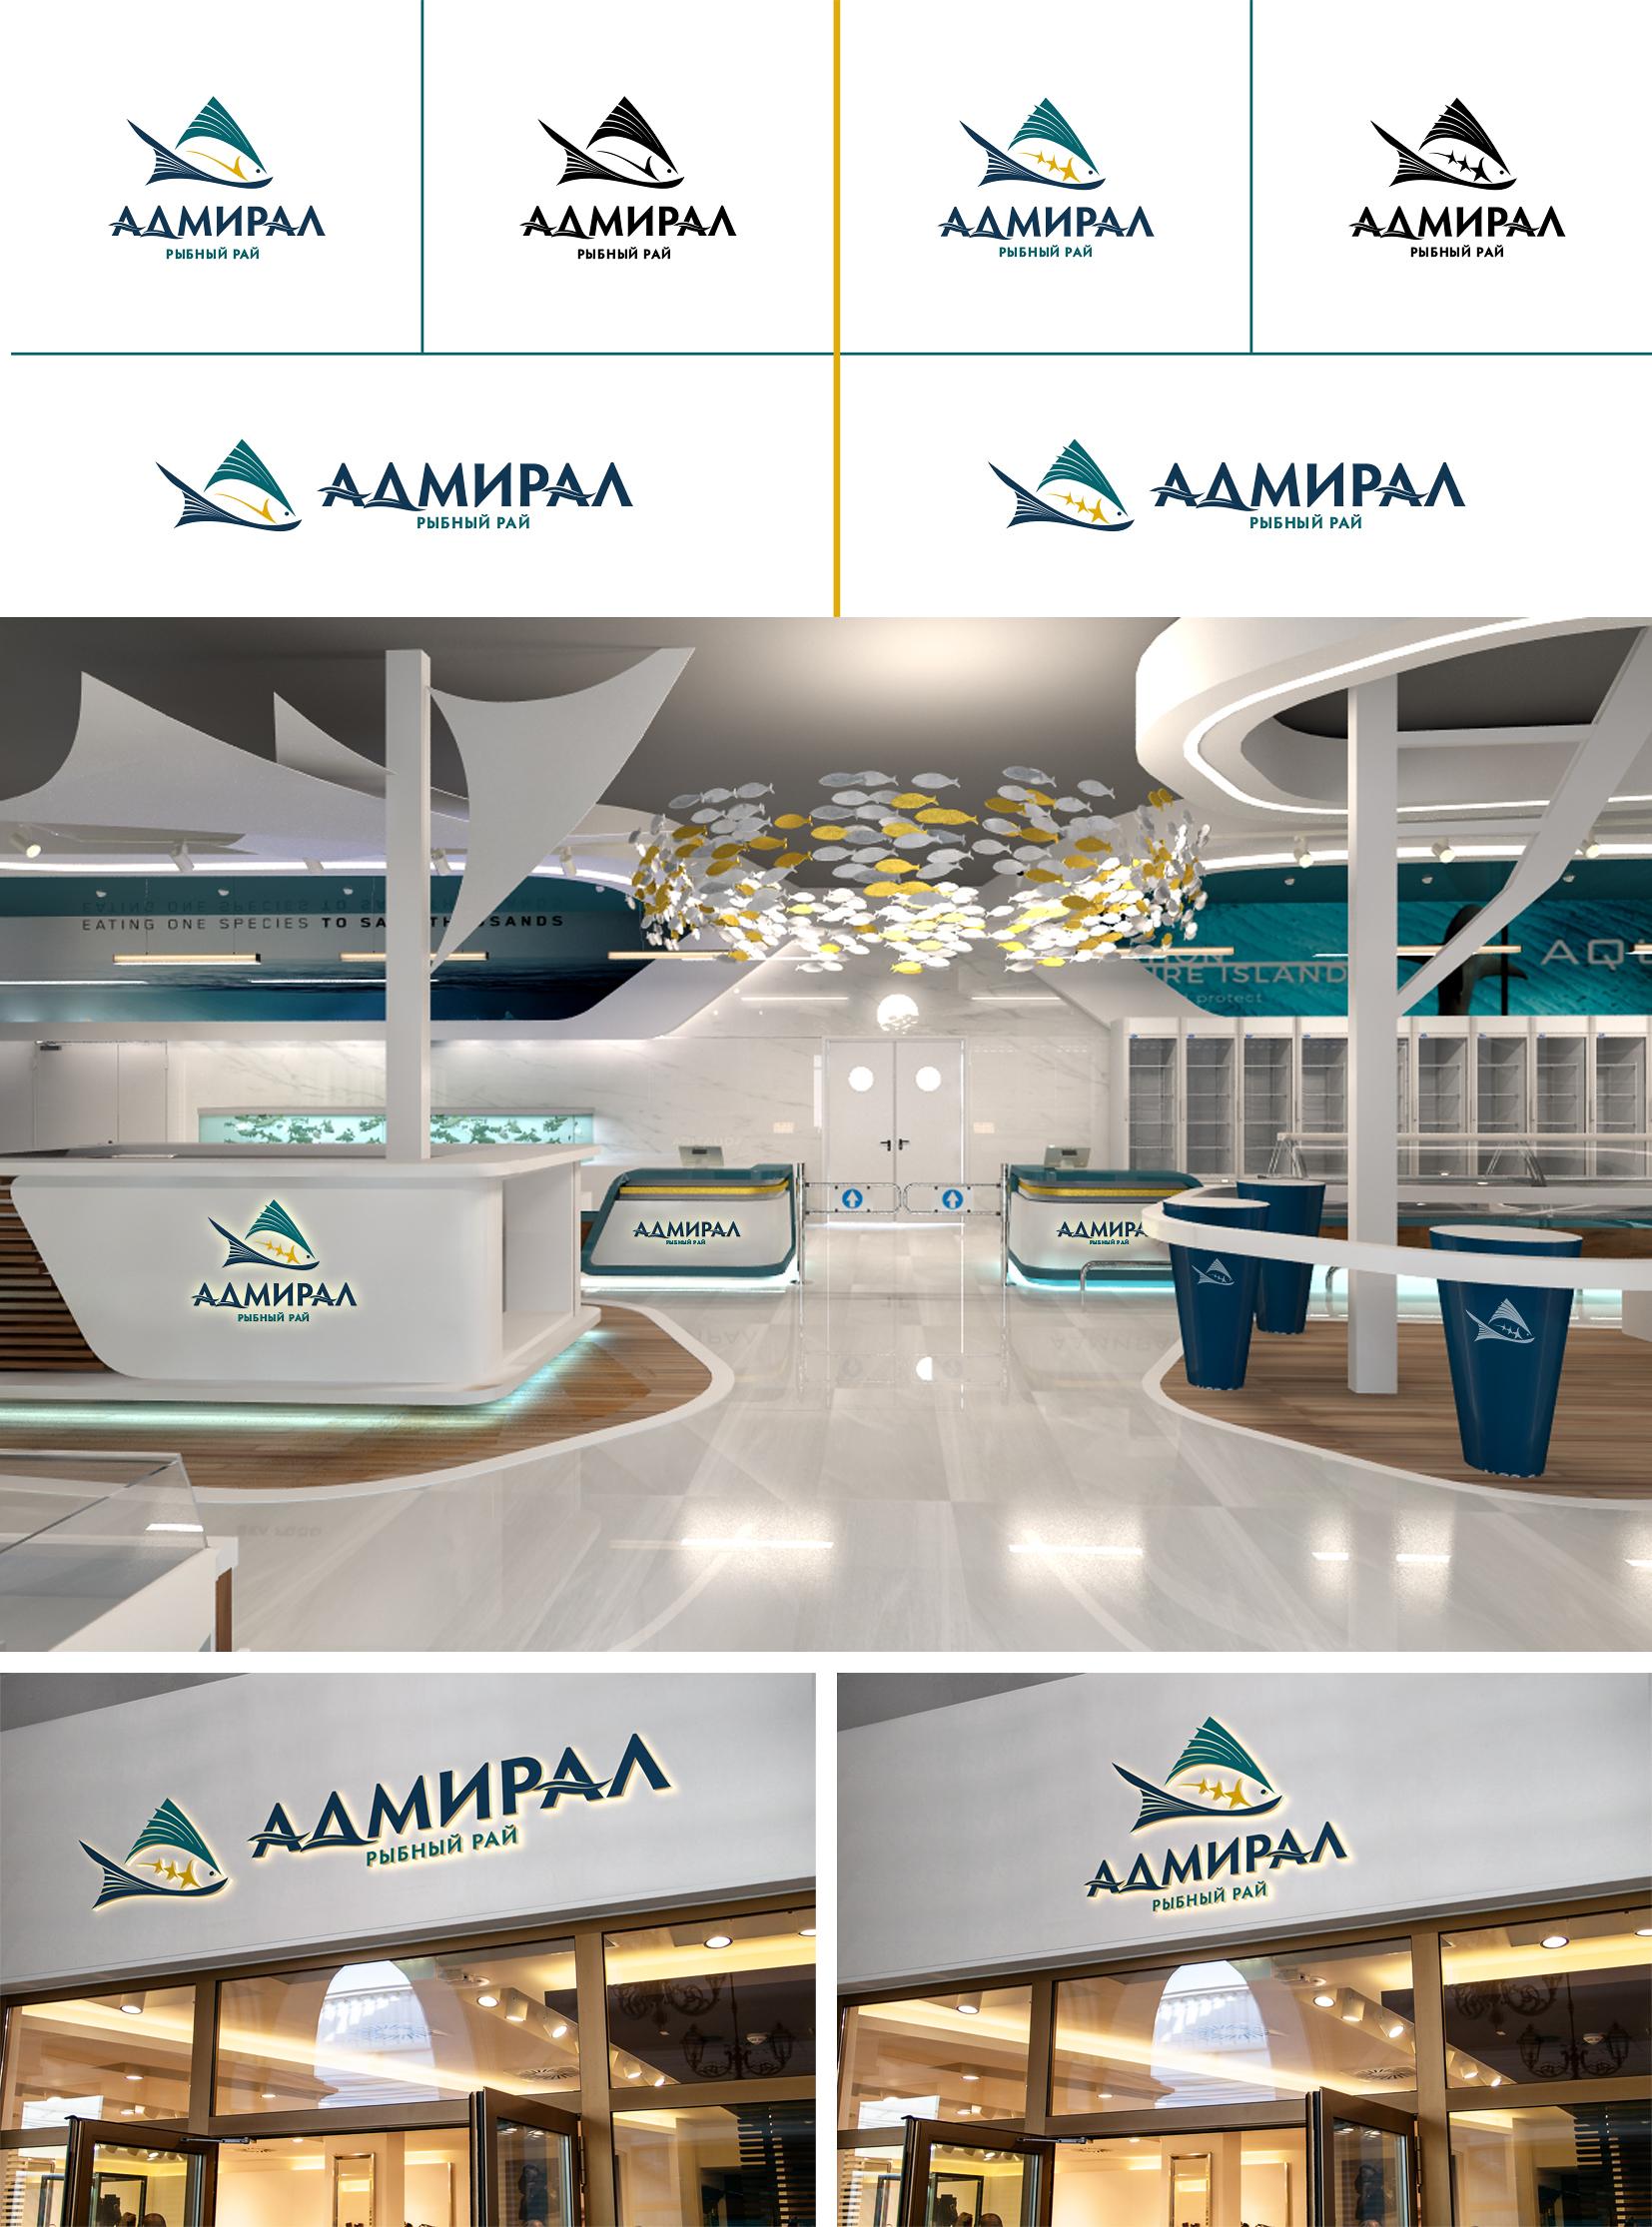 Разработка фирменного стиля для рыбного магазина фото f_4985a0d80db19150.jpg